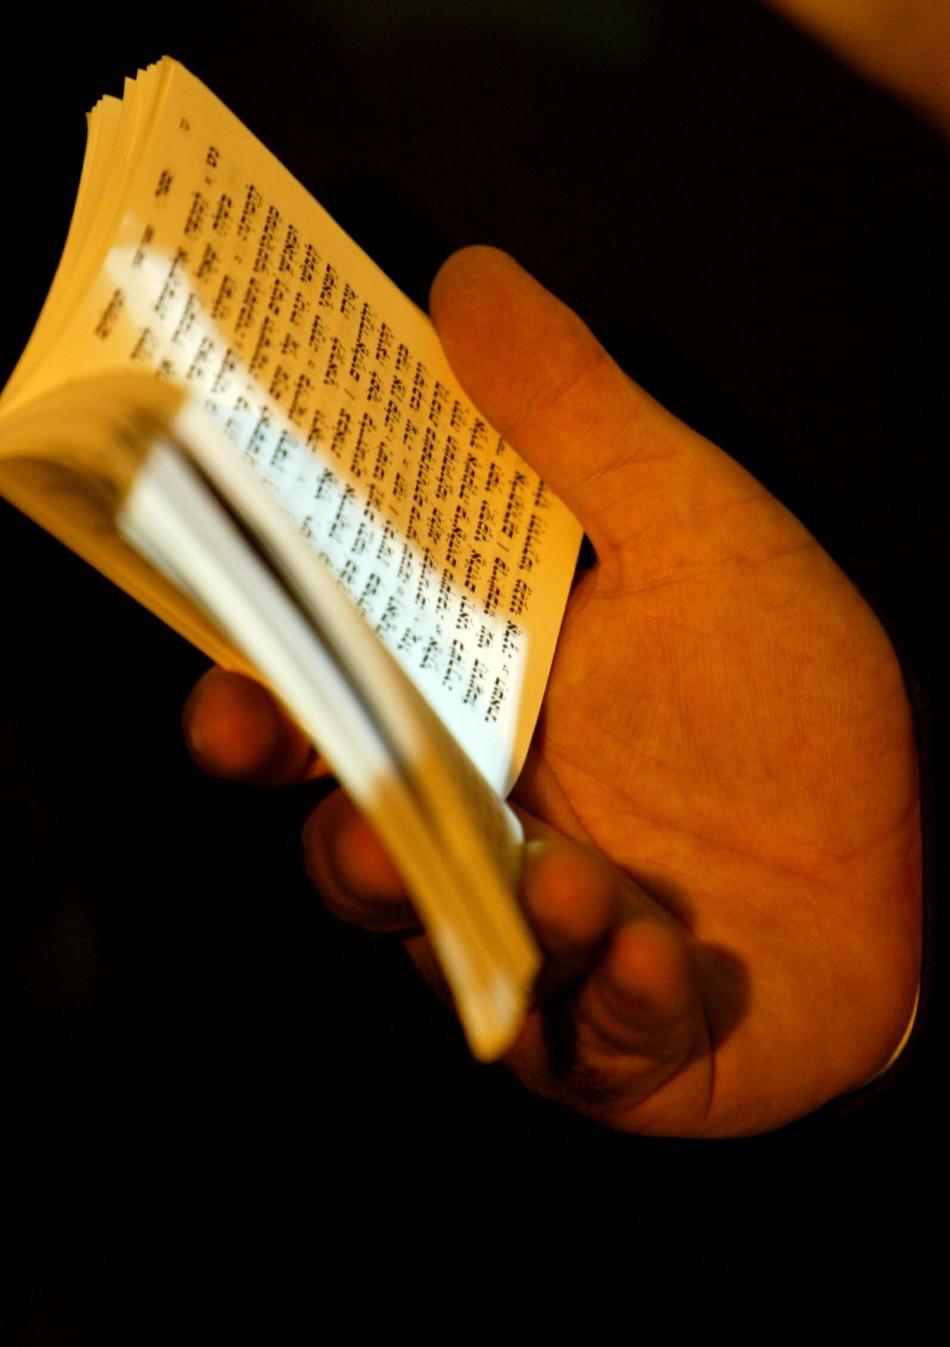 An ultra orthodox Jew holds a Torah book